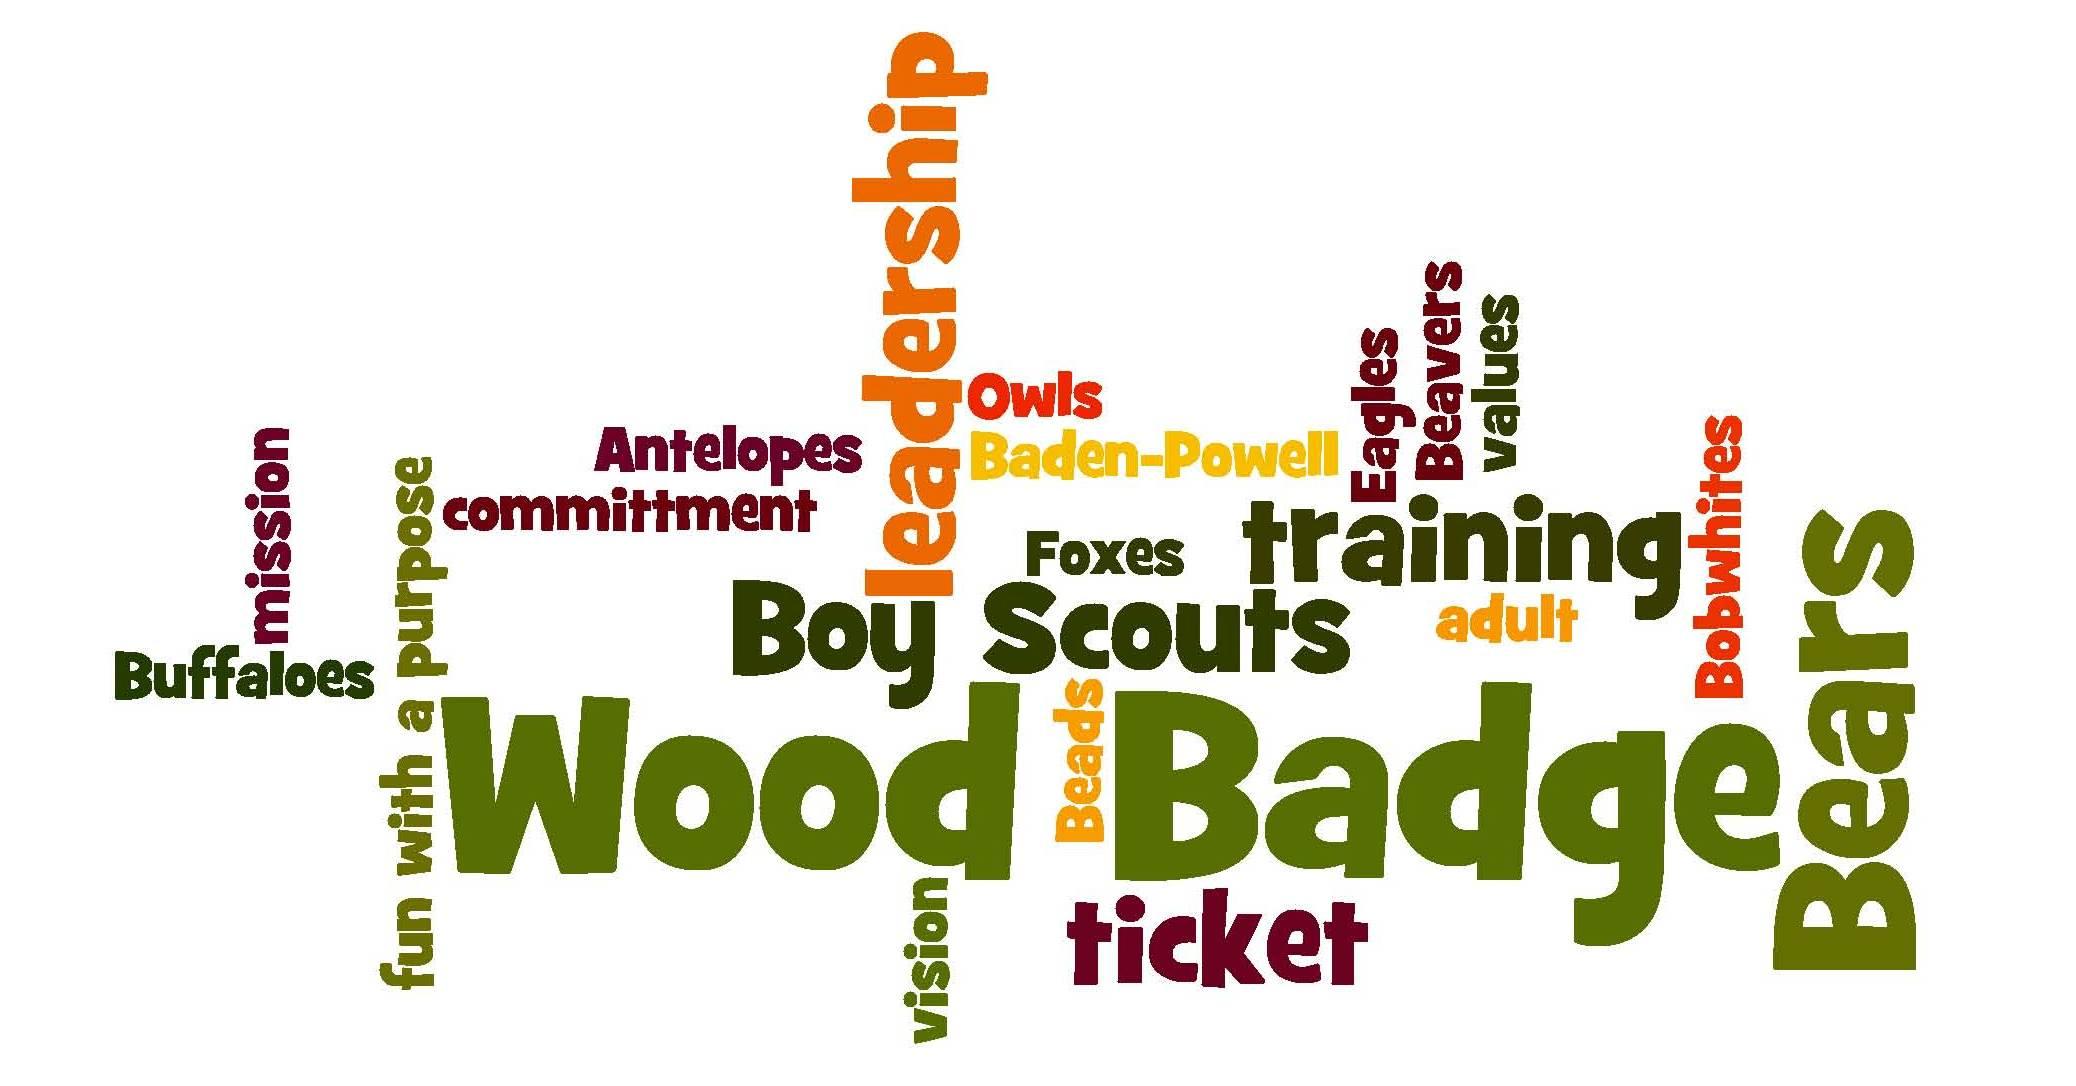 worksheet Cycling Merit Badge Worksheet worksheets citizenship in the nation merit badge worksheet woodbadge wordle image jpg wood course